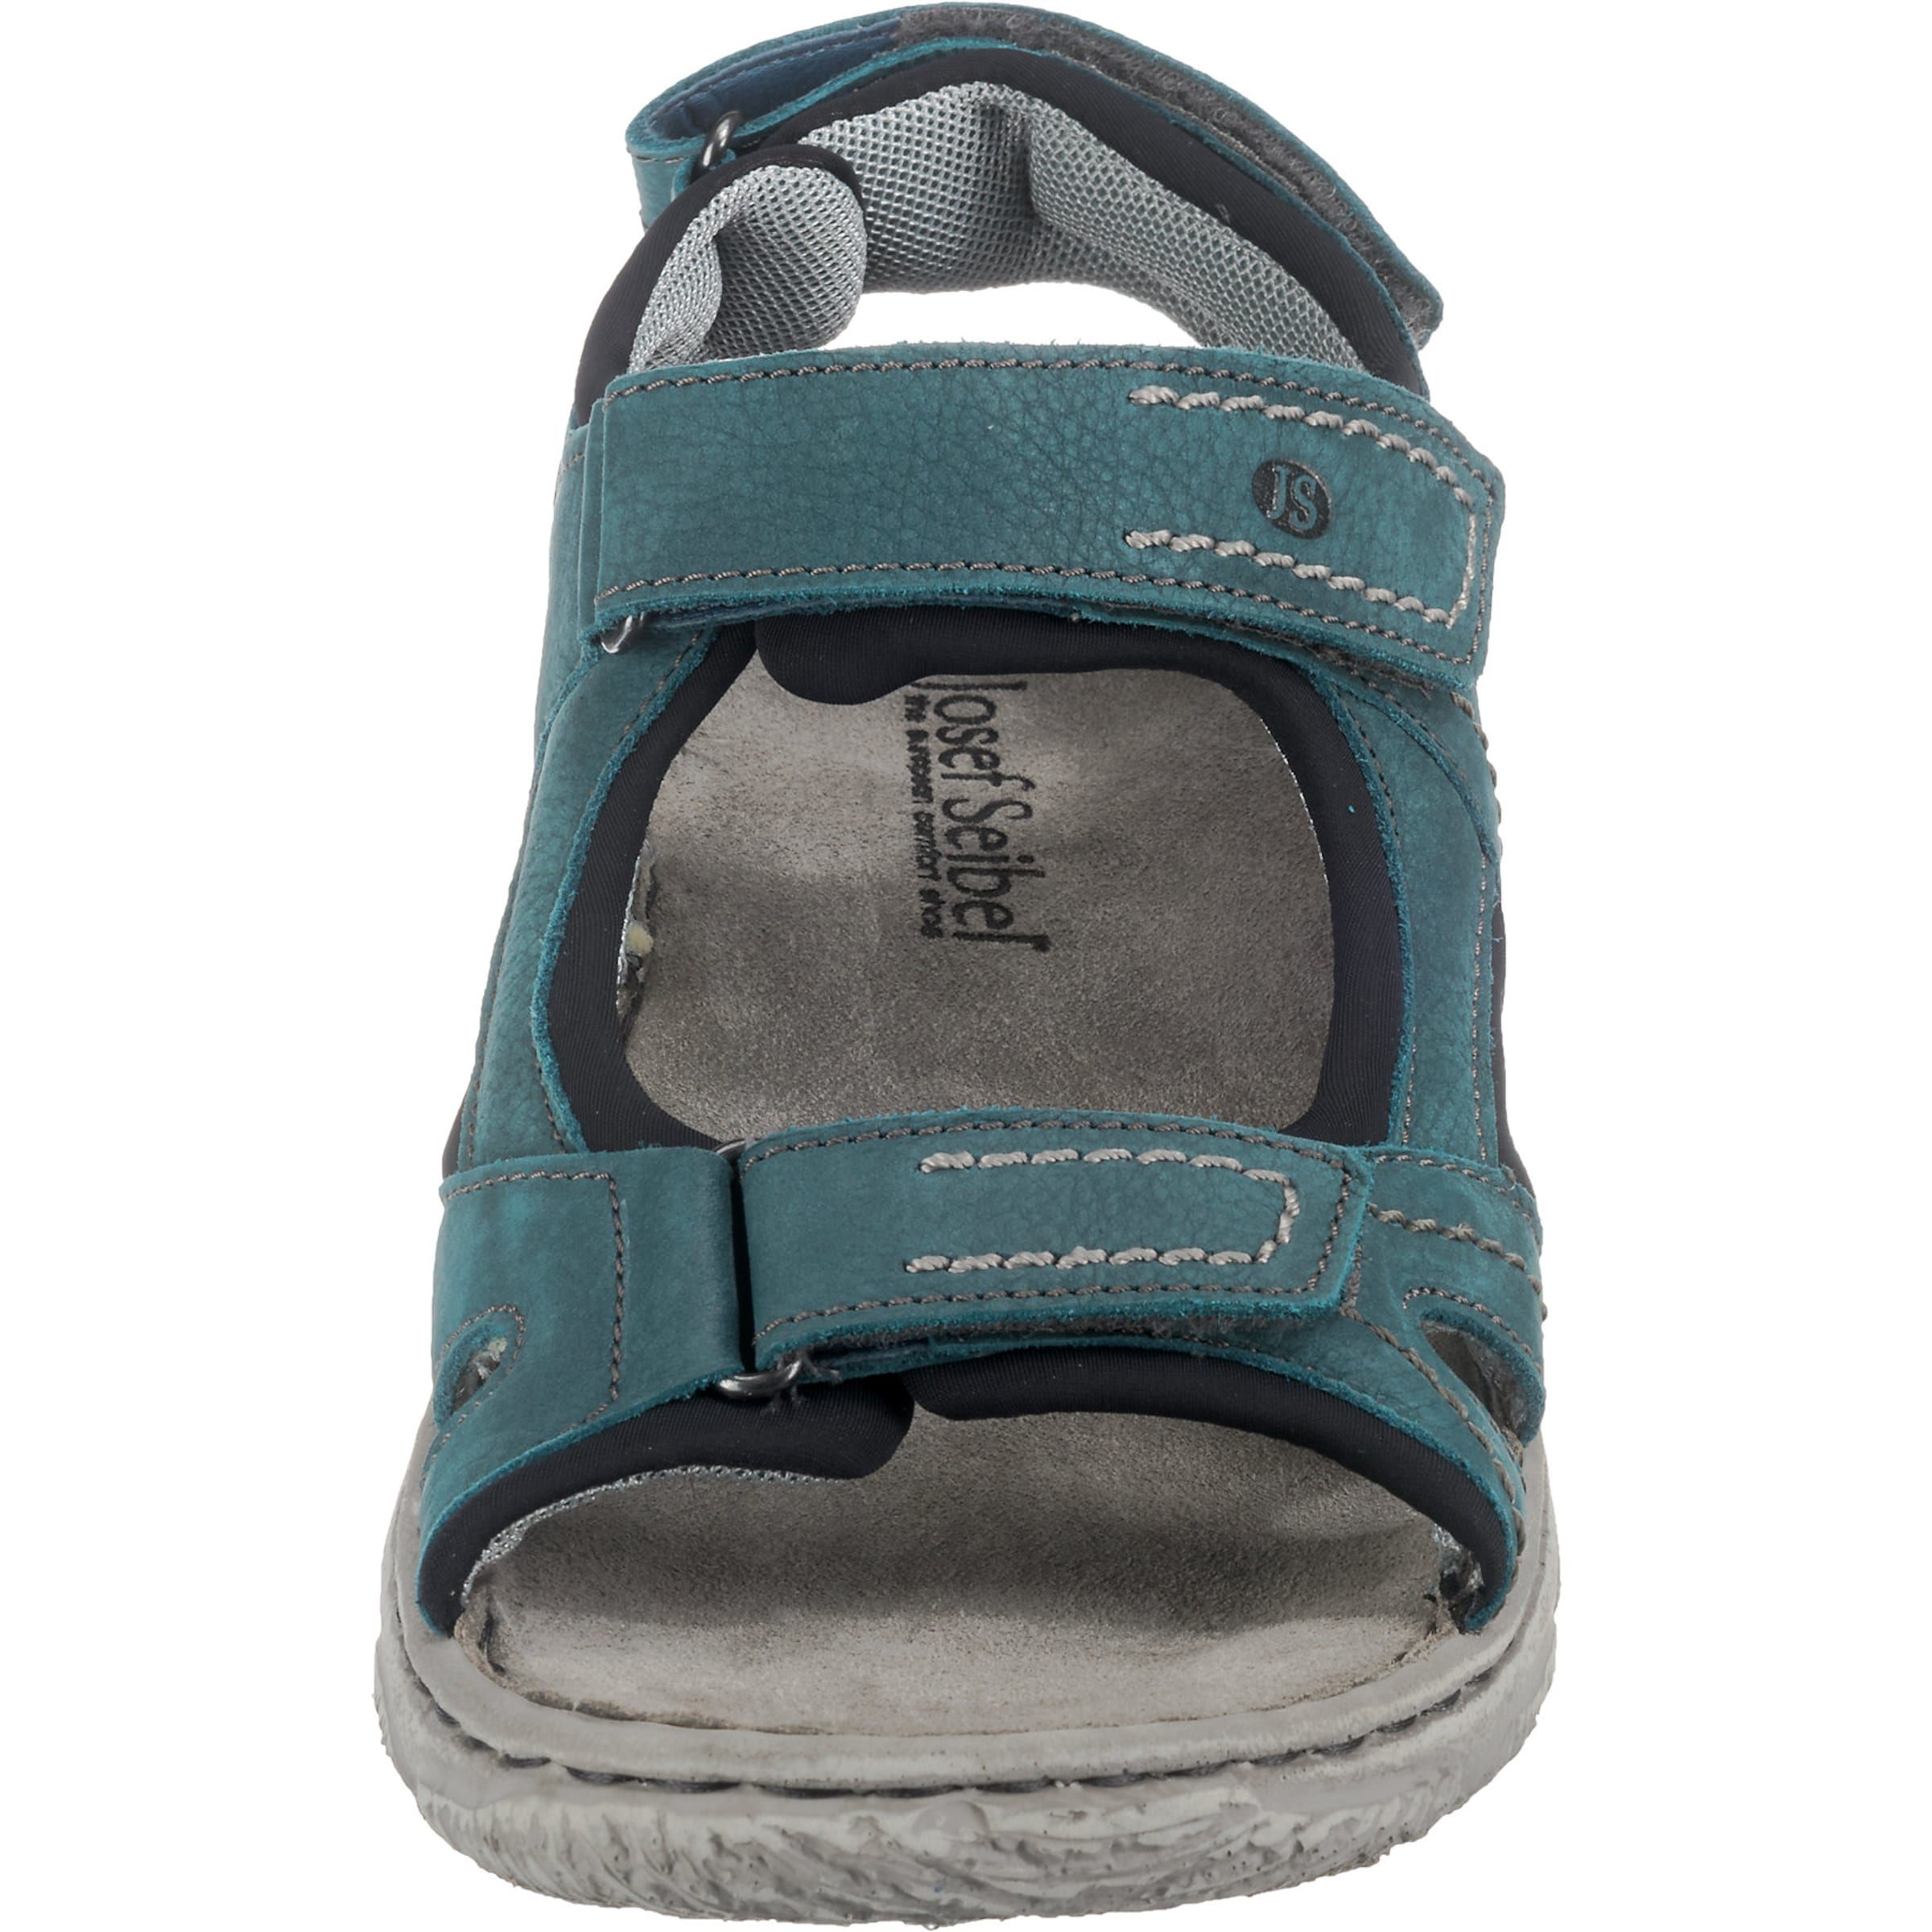 Carlo sandalen Josef In Seibel Komfort 03 Blau QCBtshrdxo